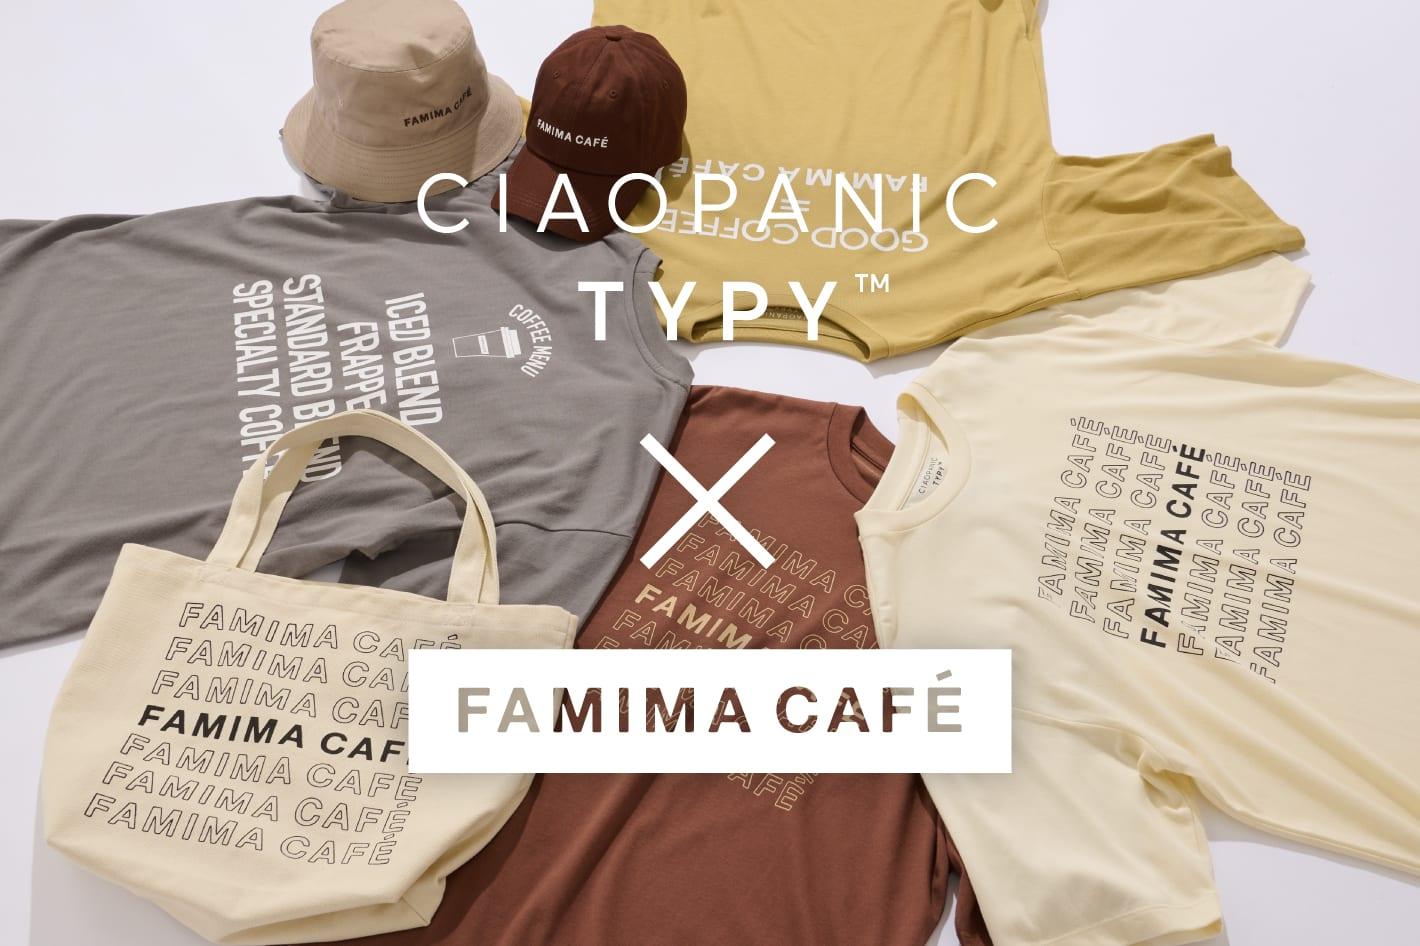 CIAOPANIC TYPY 【FAMIMA CAFÉ × CIAOPANIC TYPY】